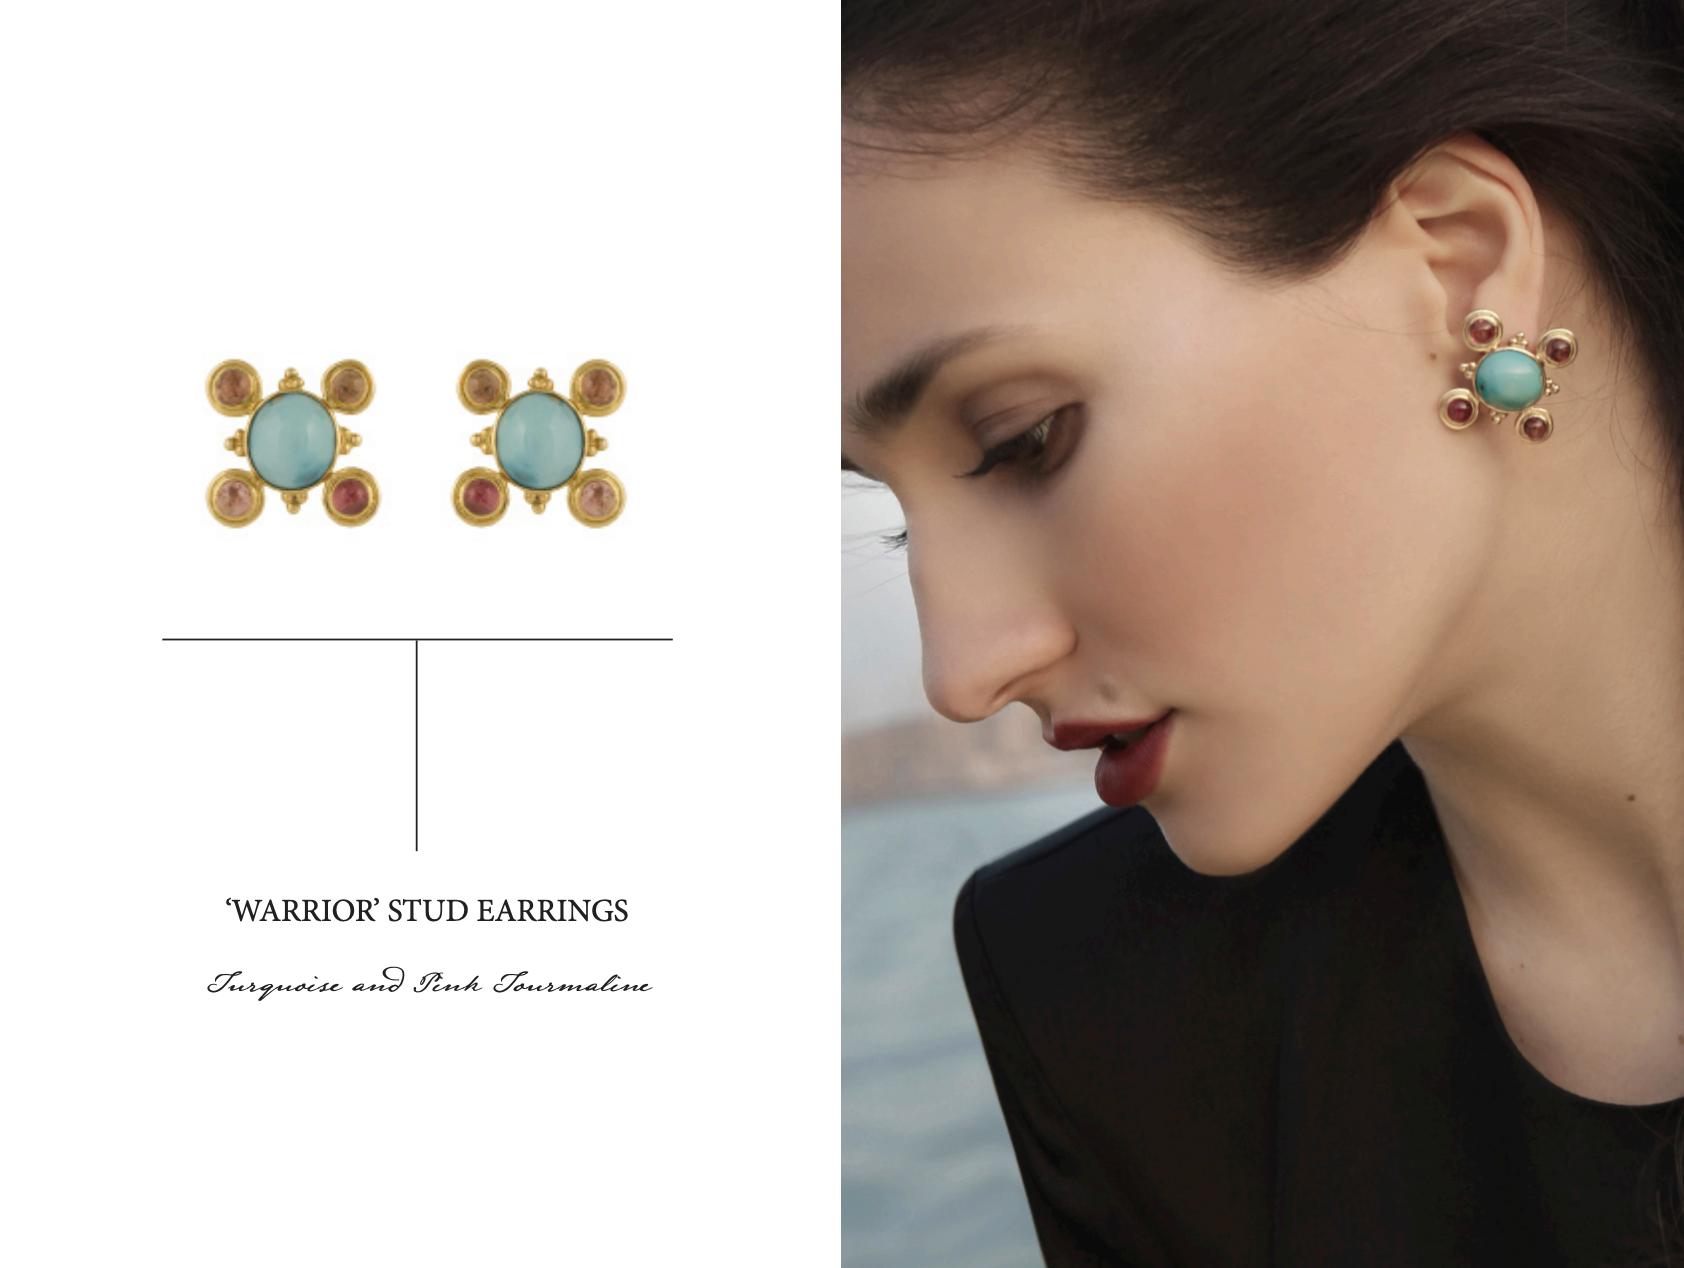 republic of toma jewelry - press kit design sarah pottharst 6.png